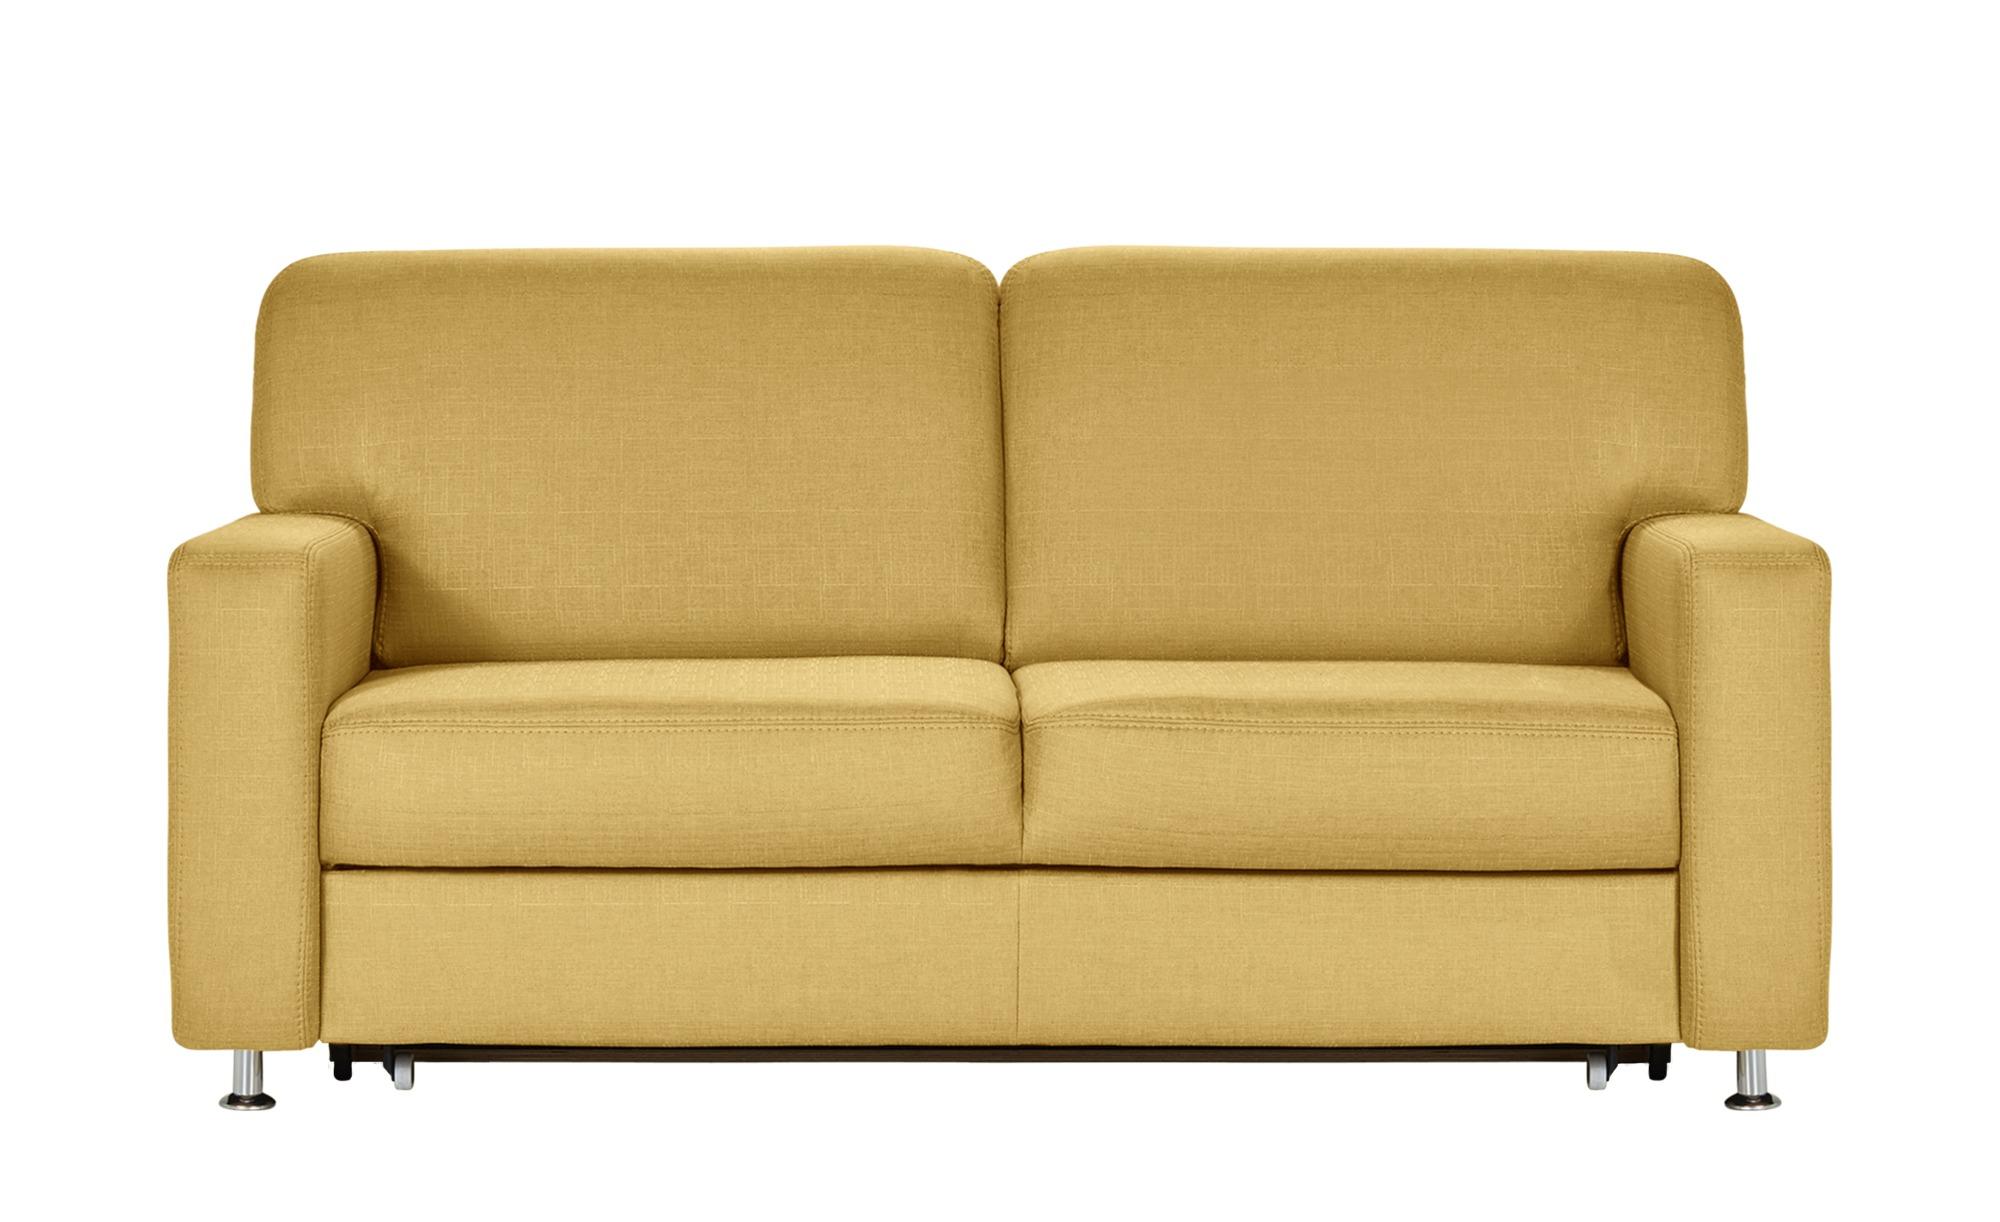 Smart Sofa 2 5 Sitzig Valencia Valencia Sofa Und Hoffner